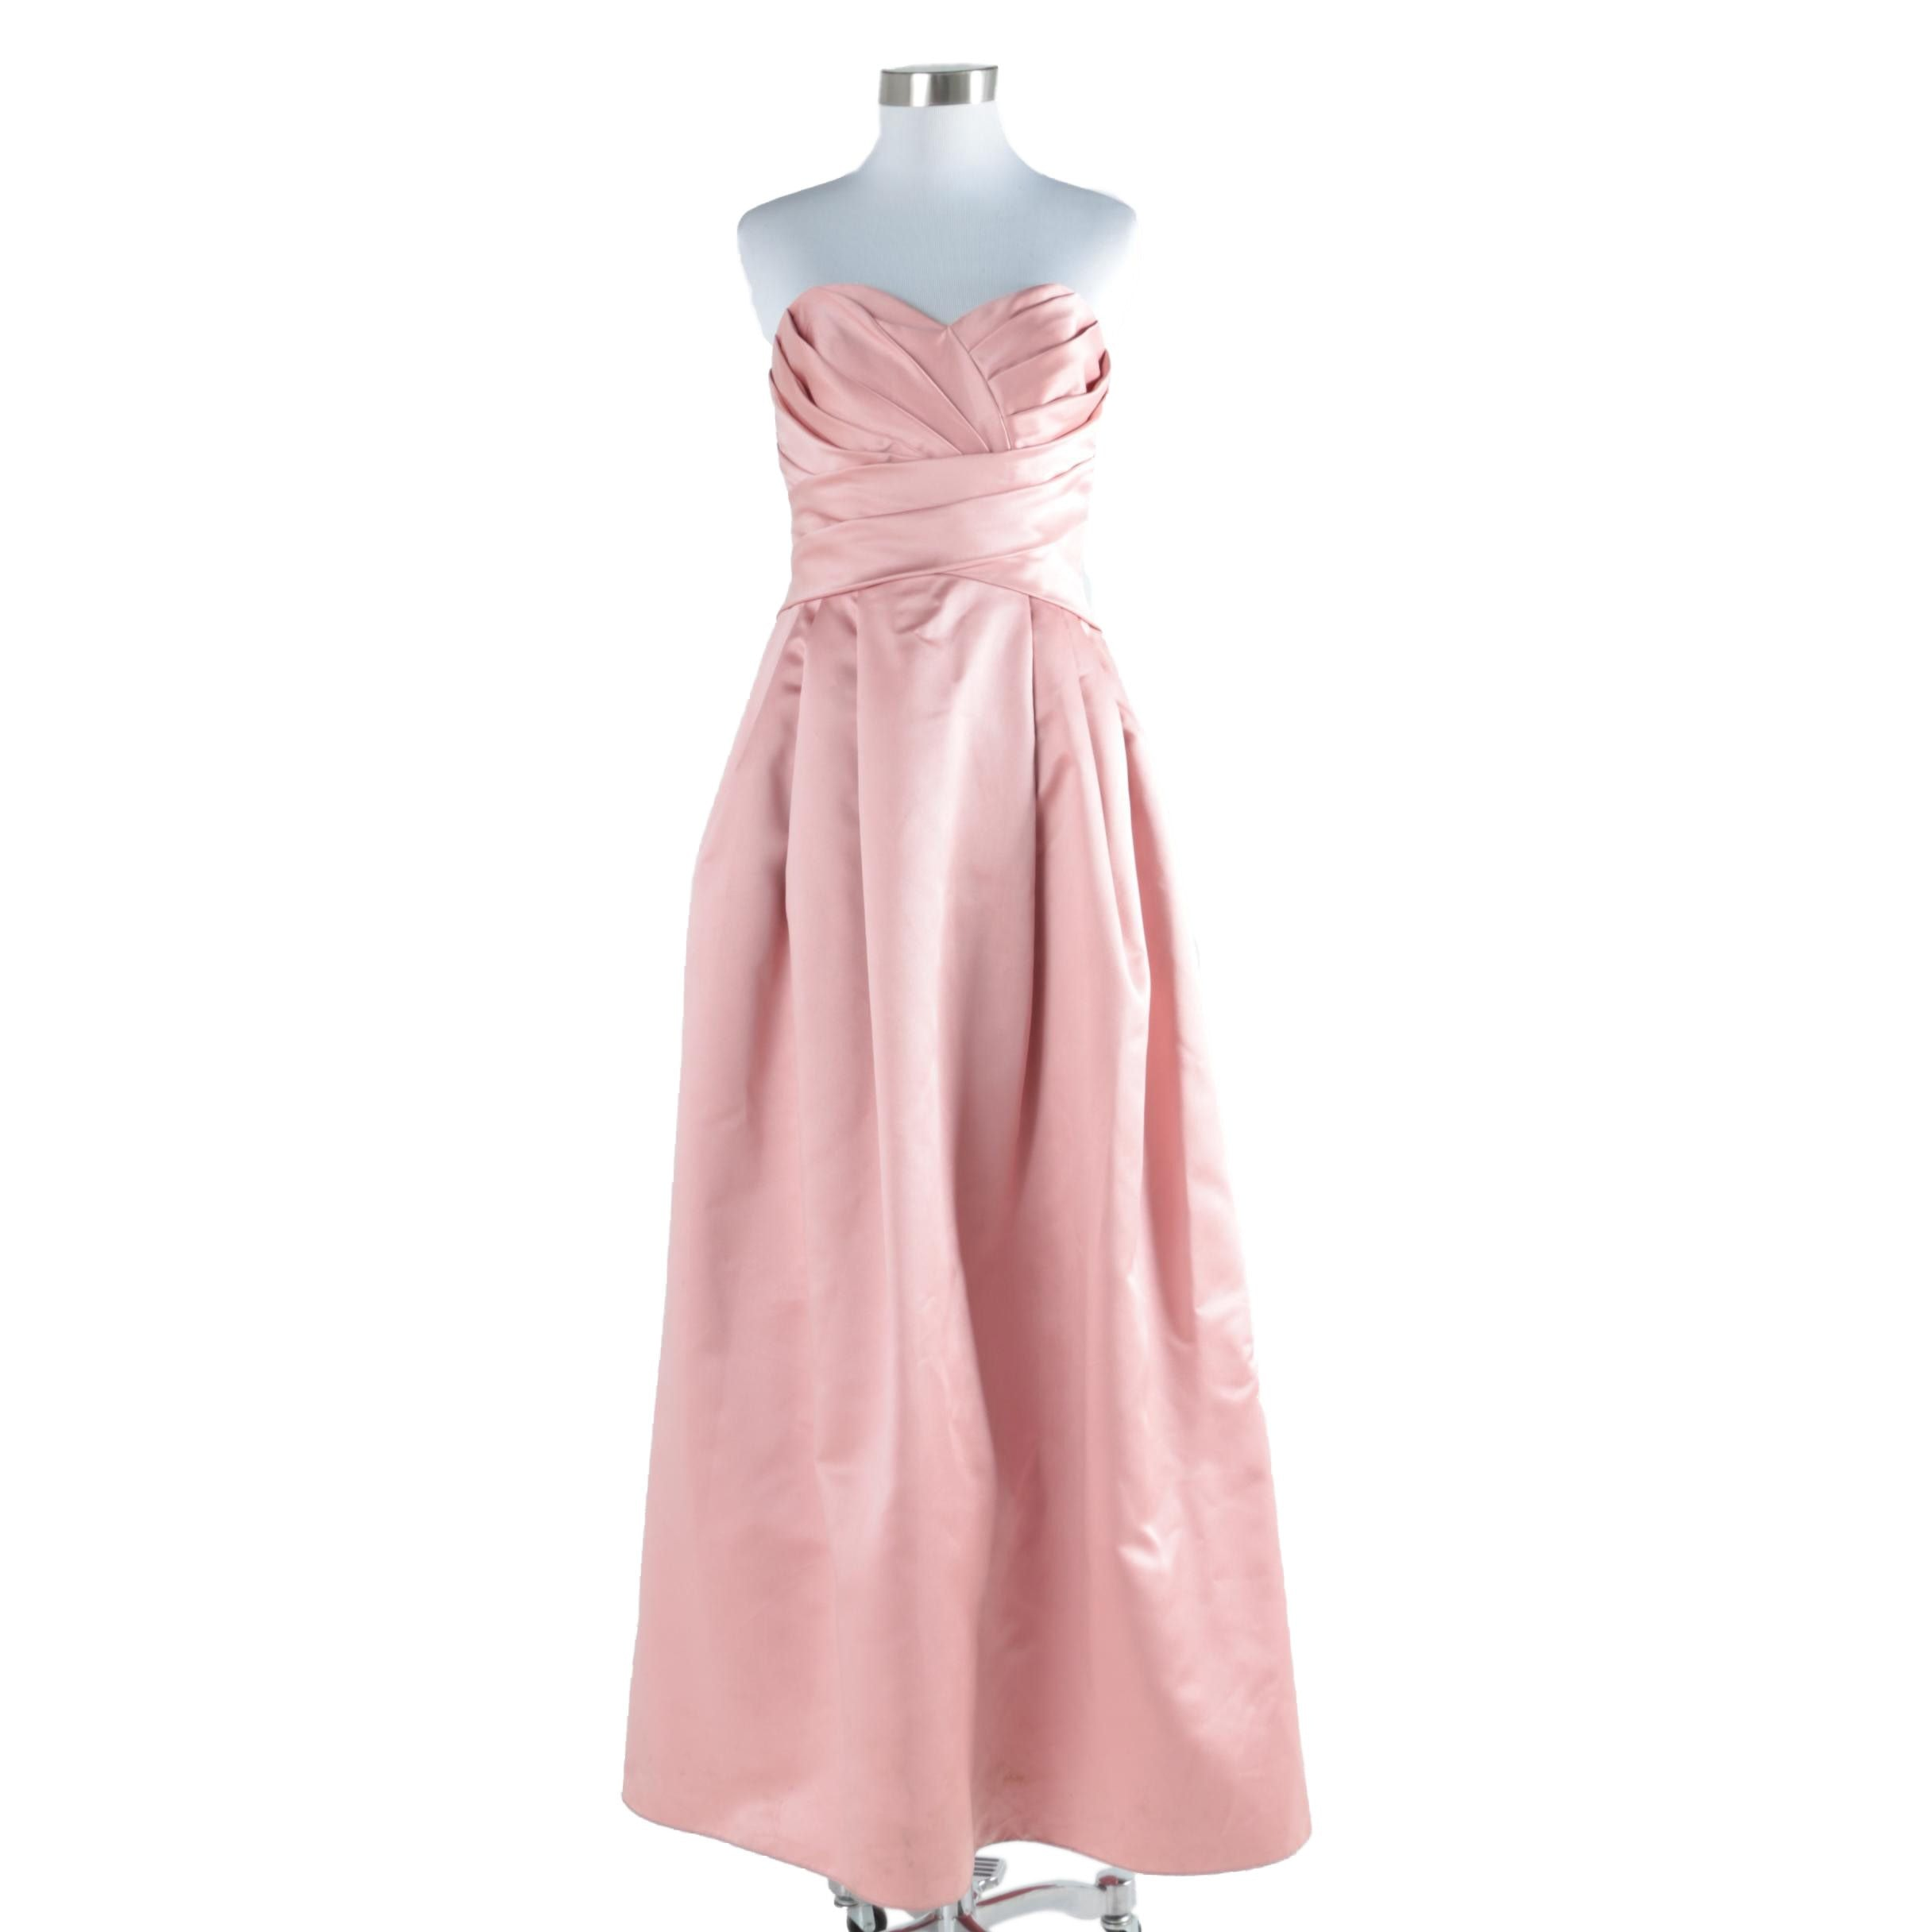 David's Bridal Formal Satin Gown